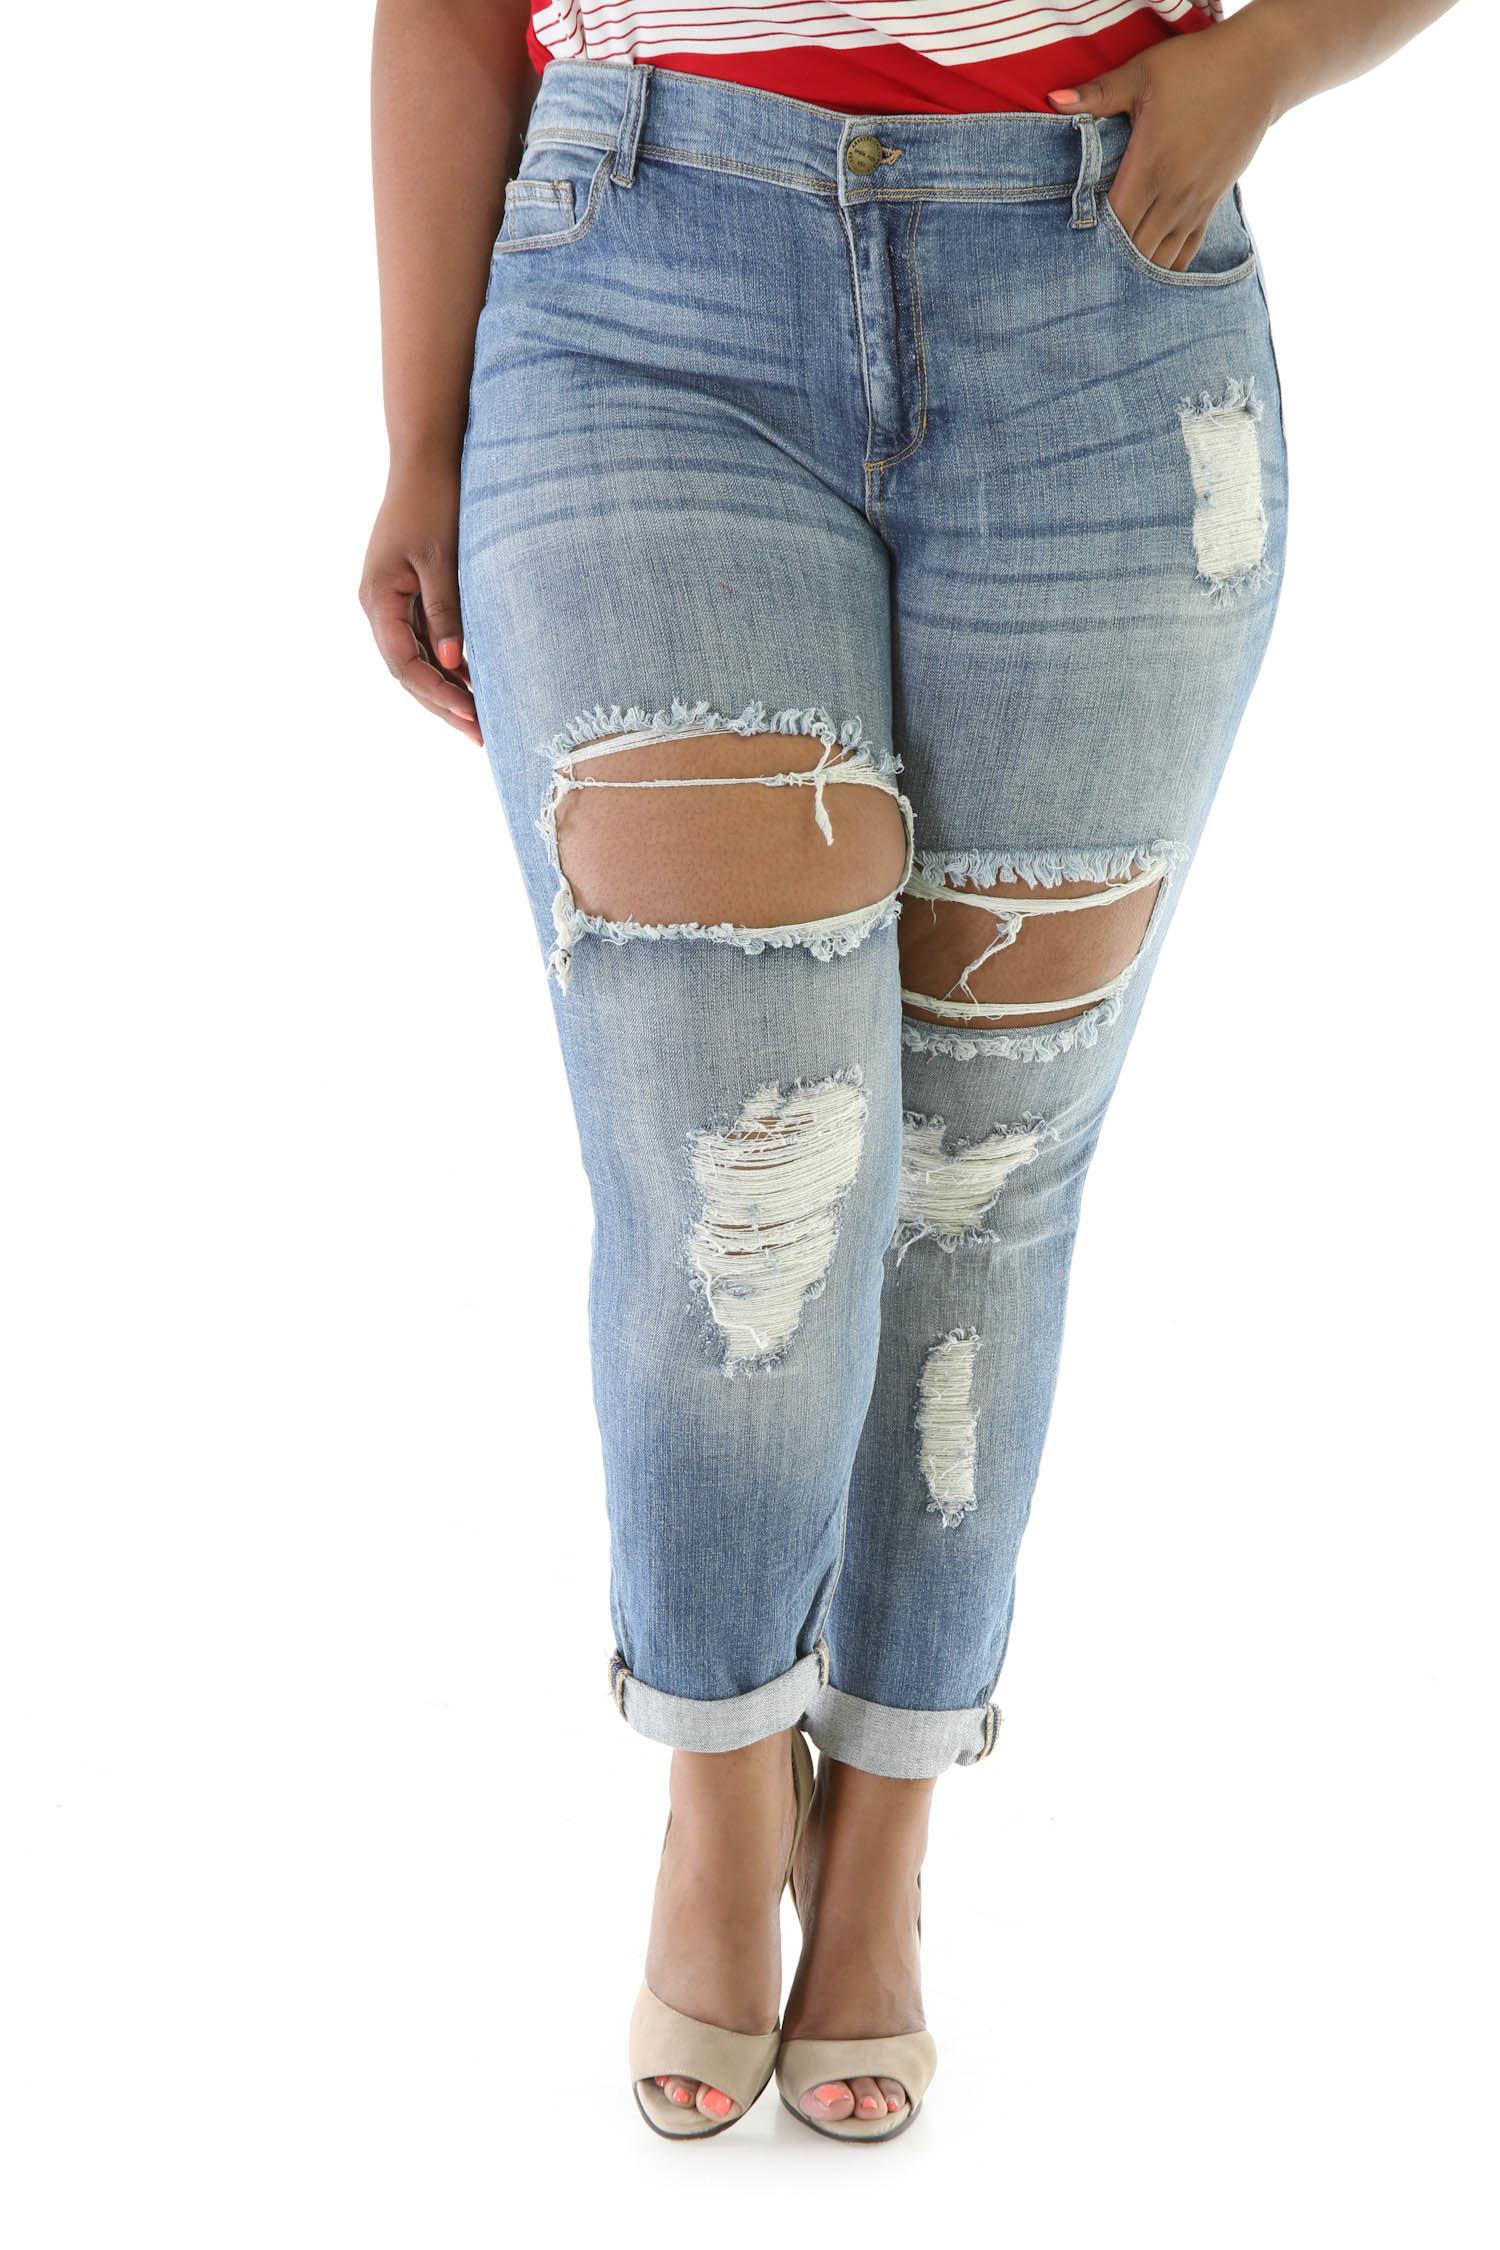 Distress Hole Jeans